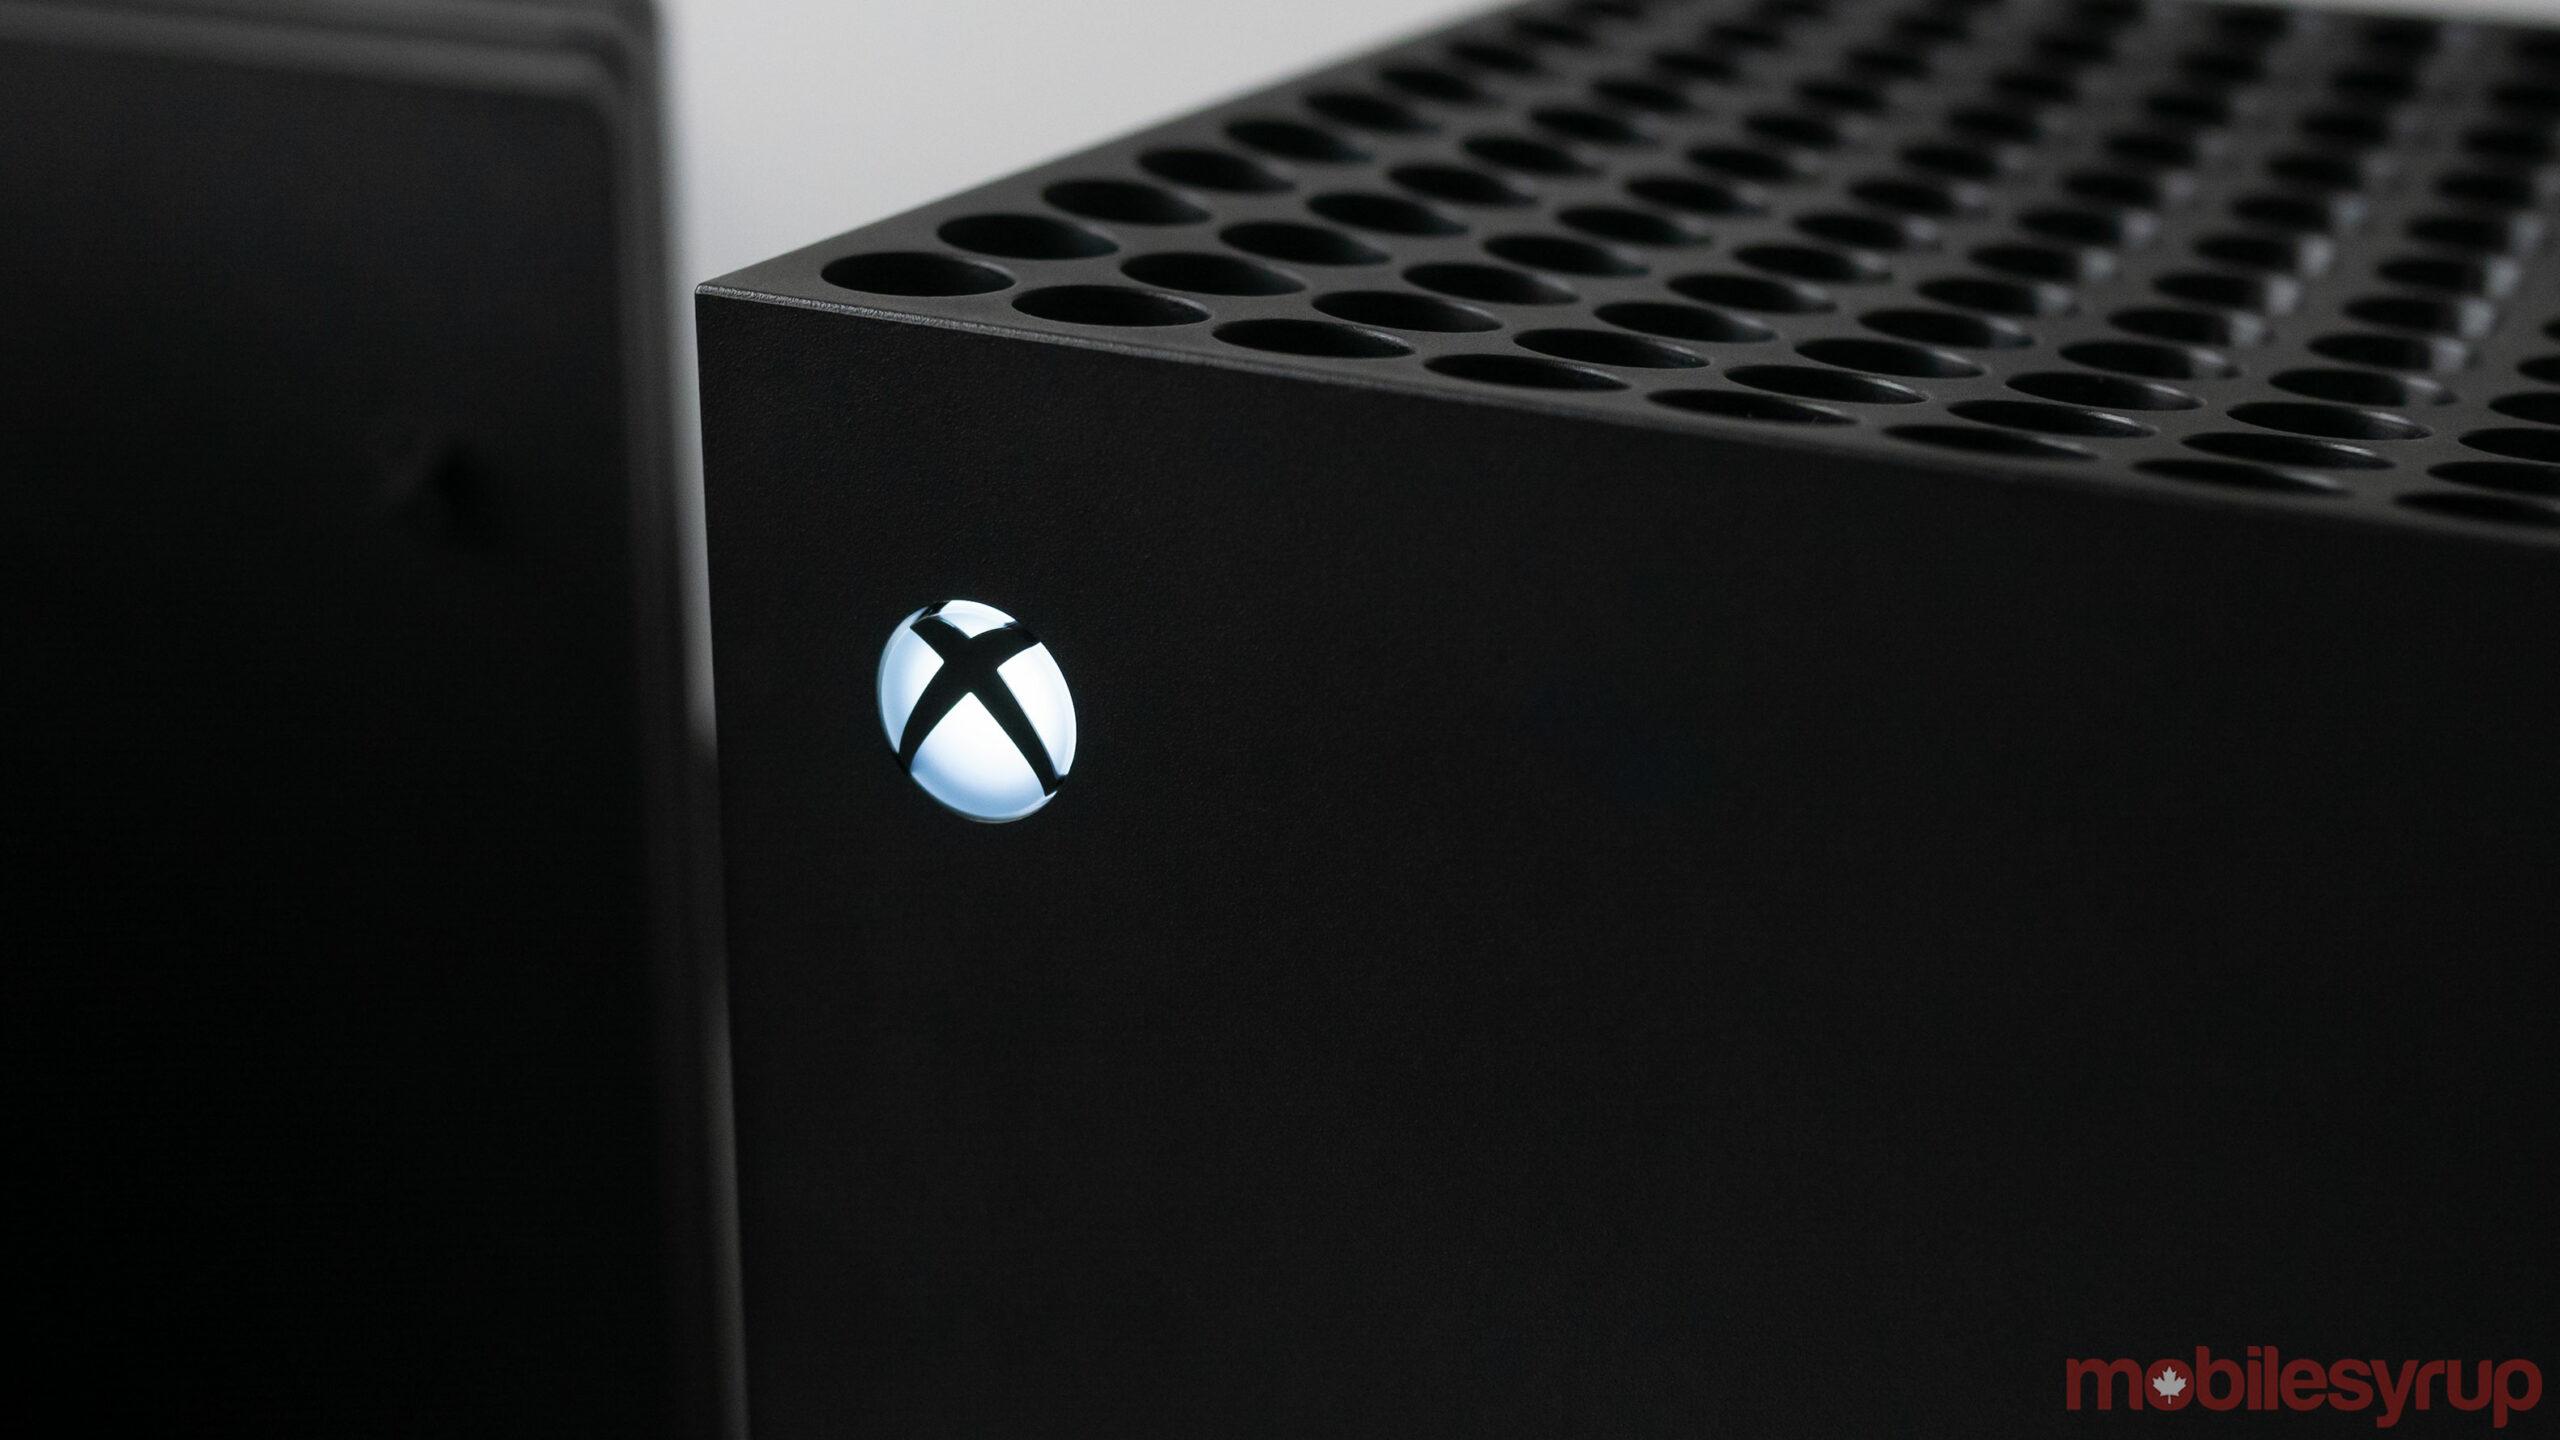 Microsoft now testing Edge Chromium browser on Xbox